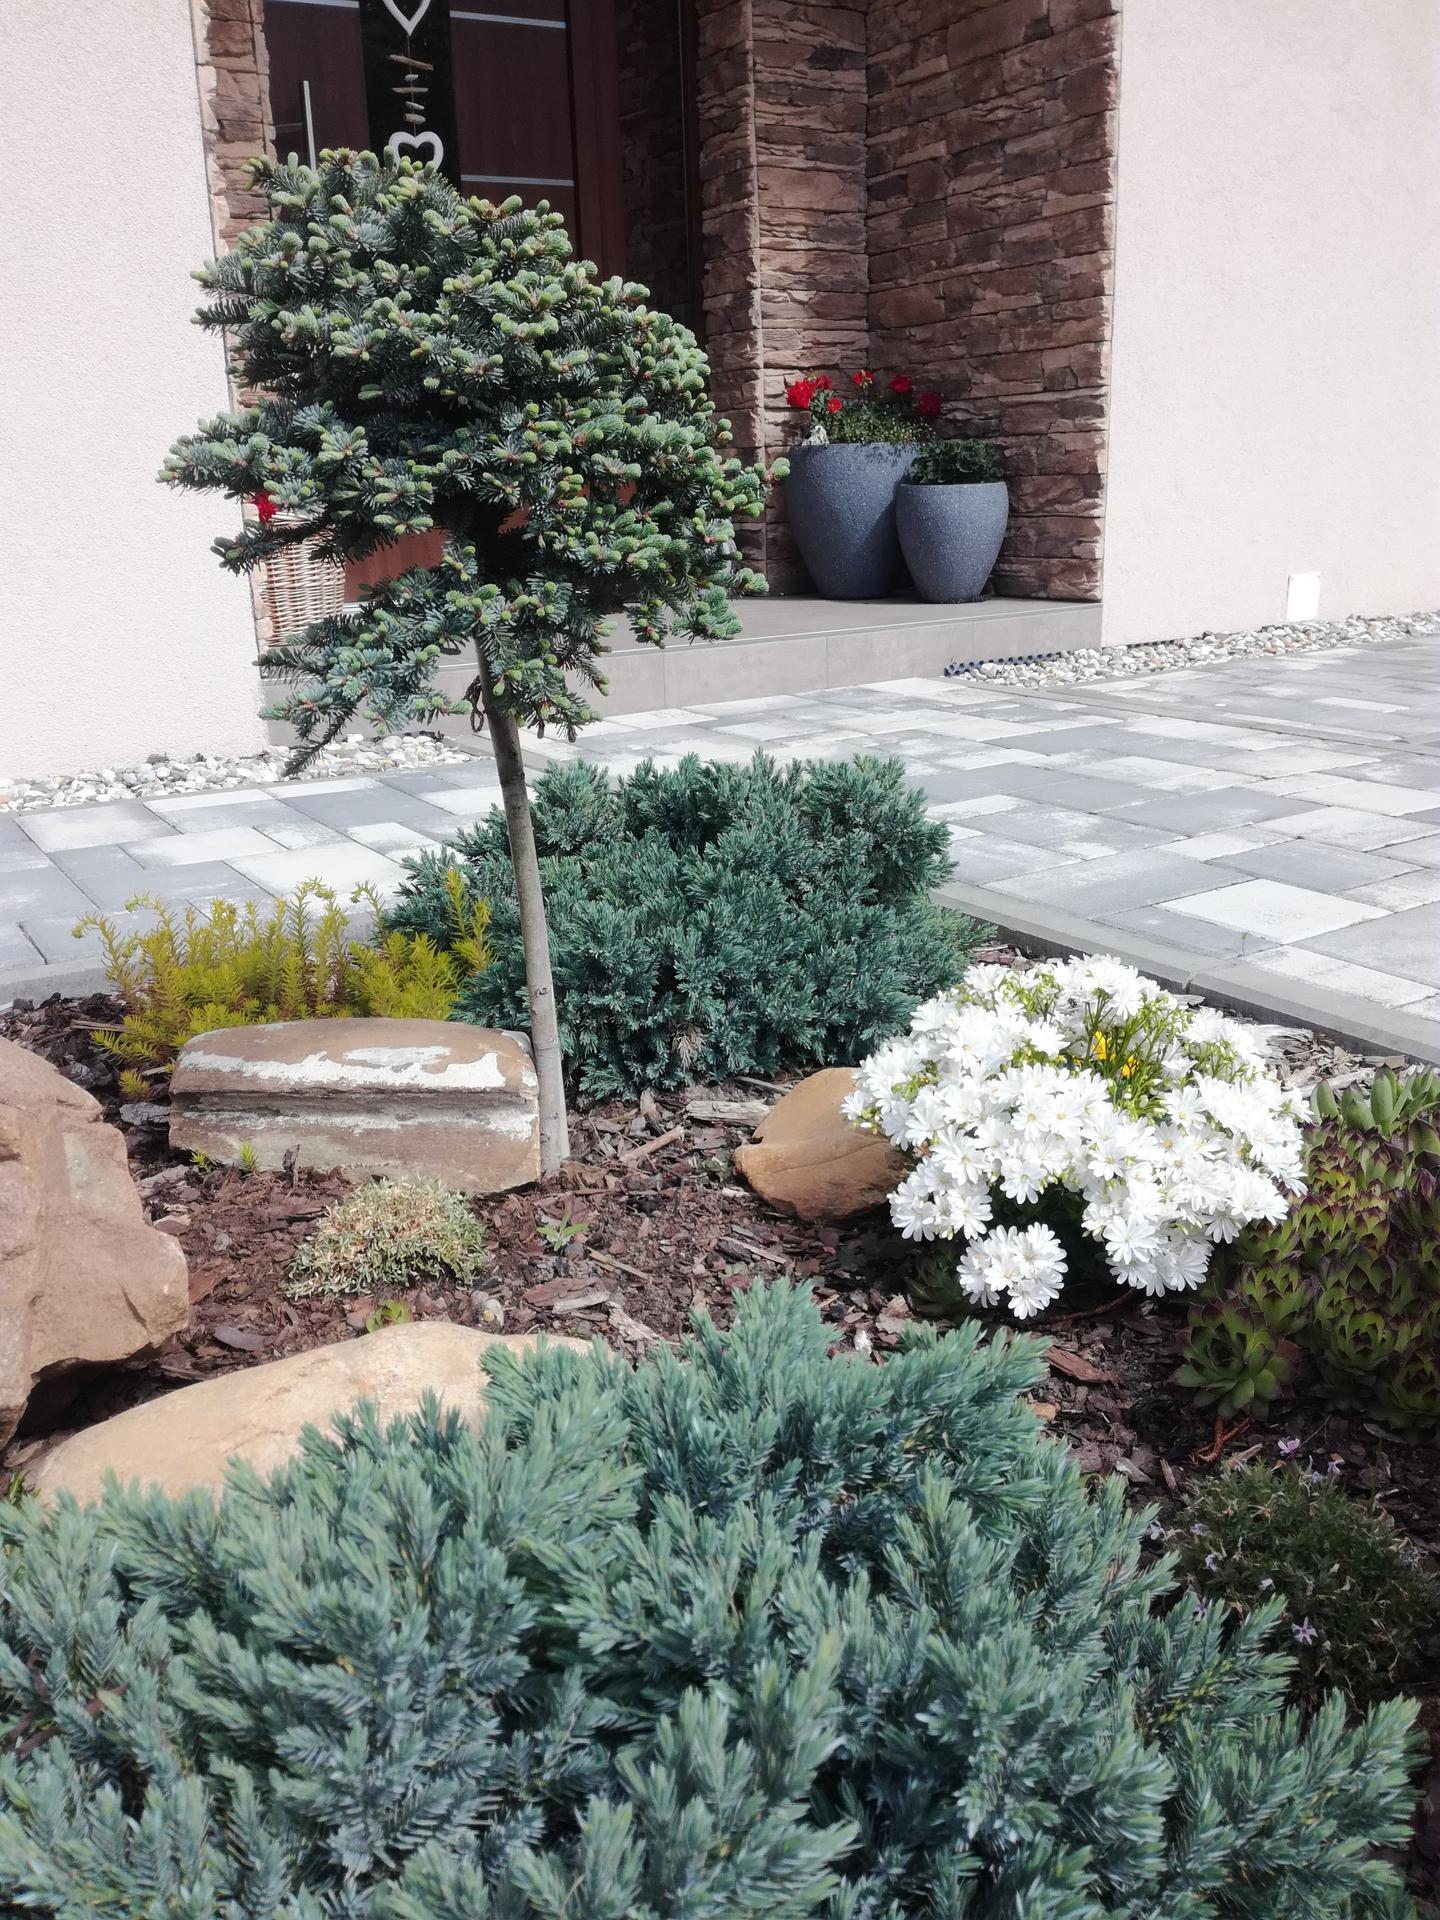 Zahrada 2021 🌲 - Obrázek č. 95